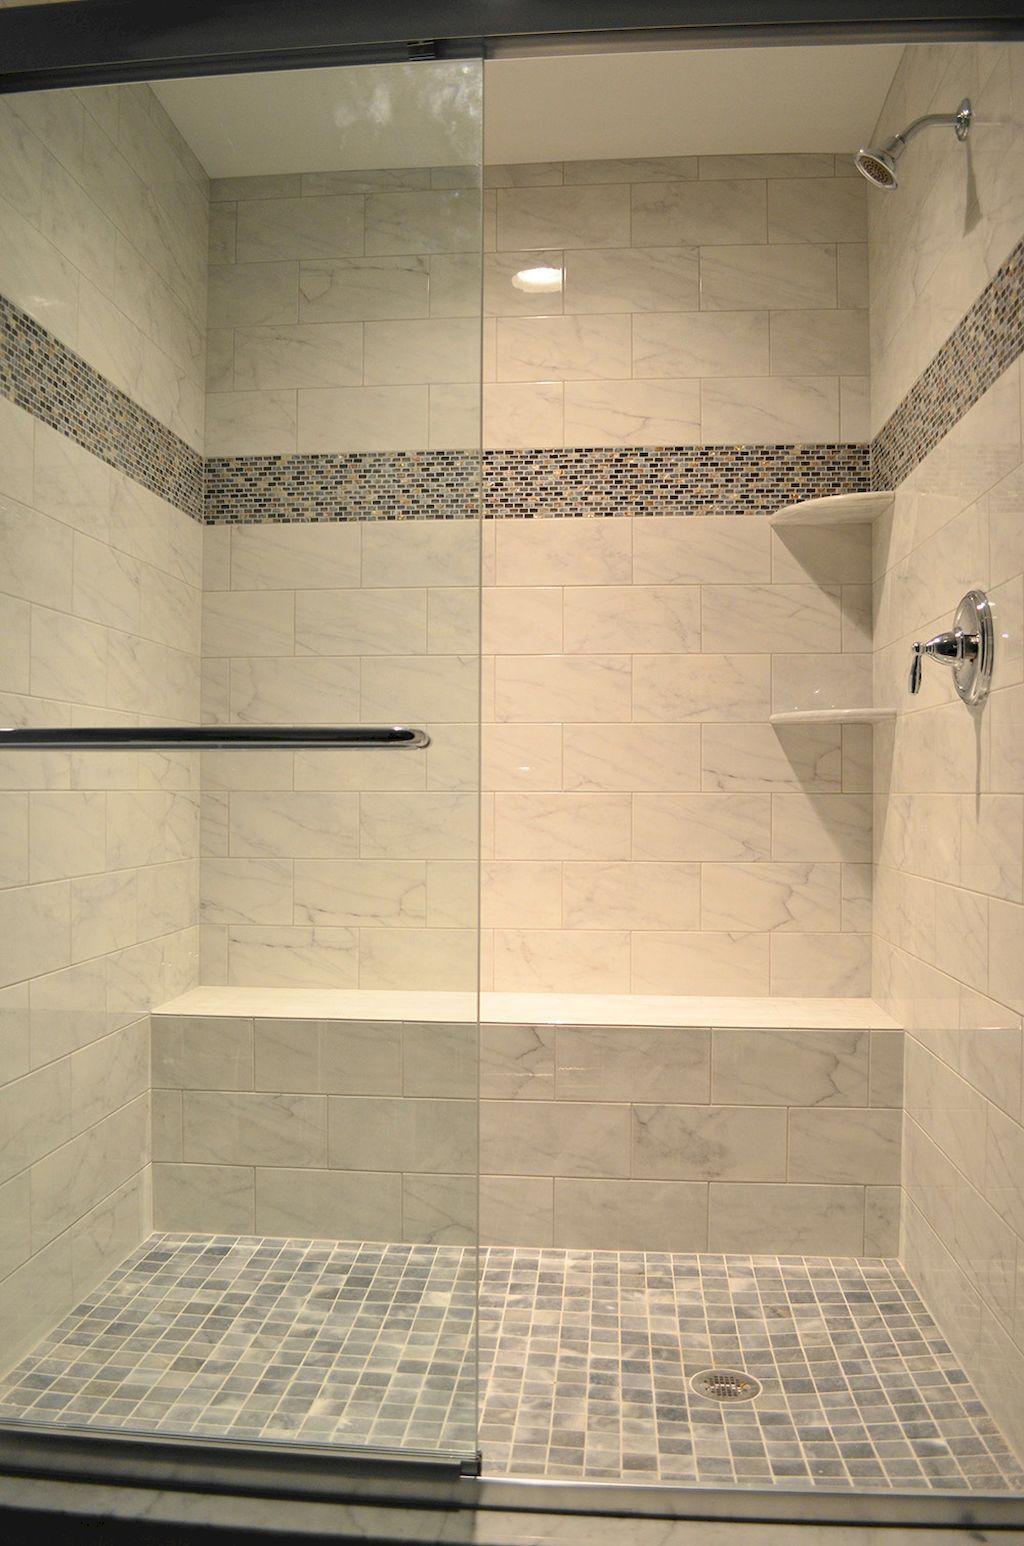 60 Adorable Master Bathroom Shower Remodel Ideas 47 Master Bathroom Shower Shower Remodel Shower Makeover